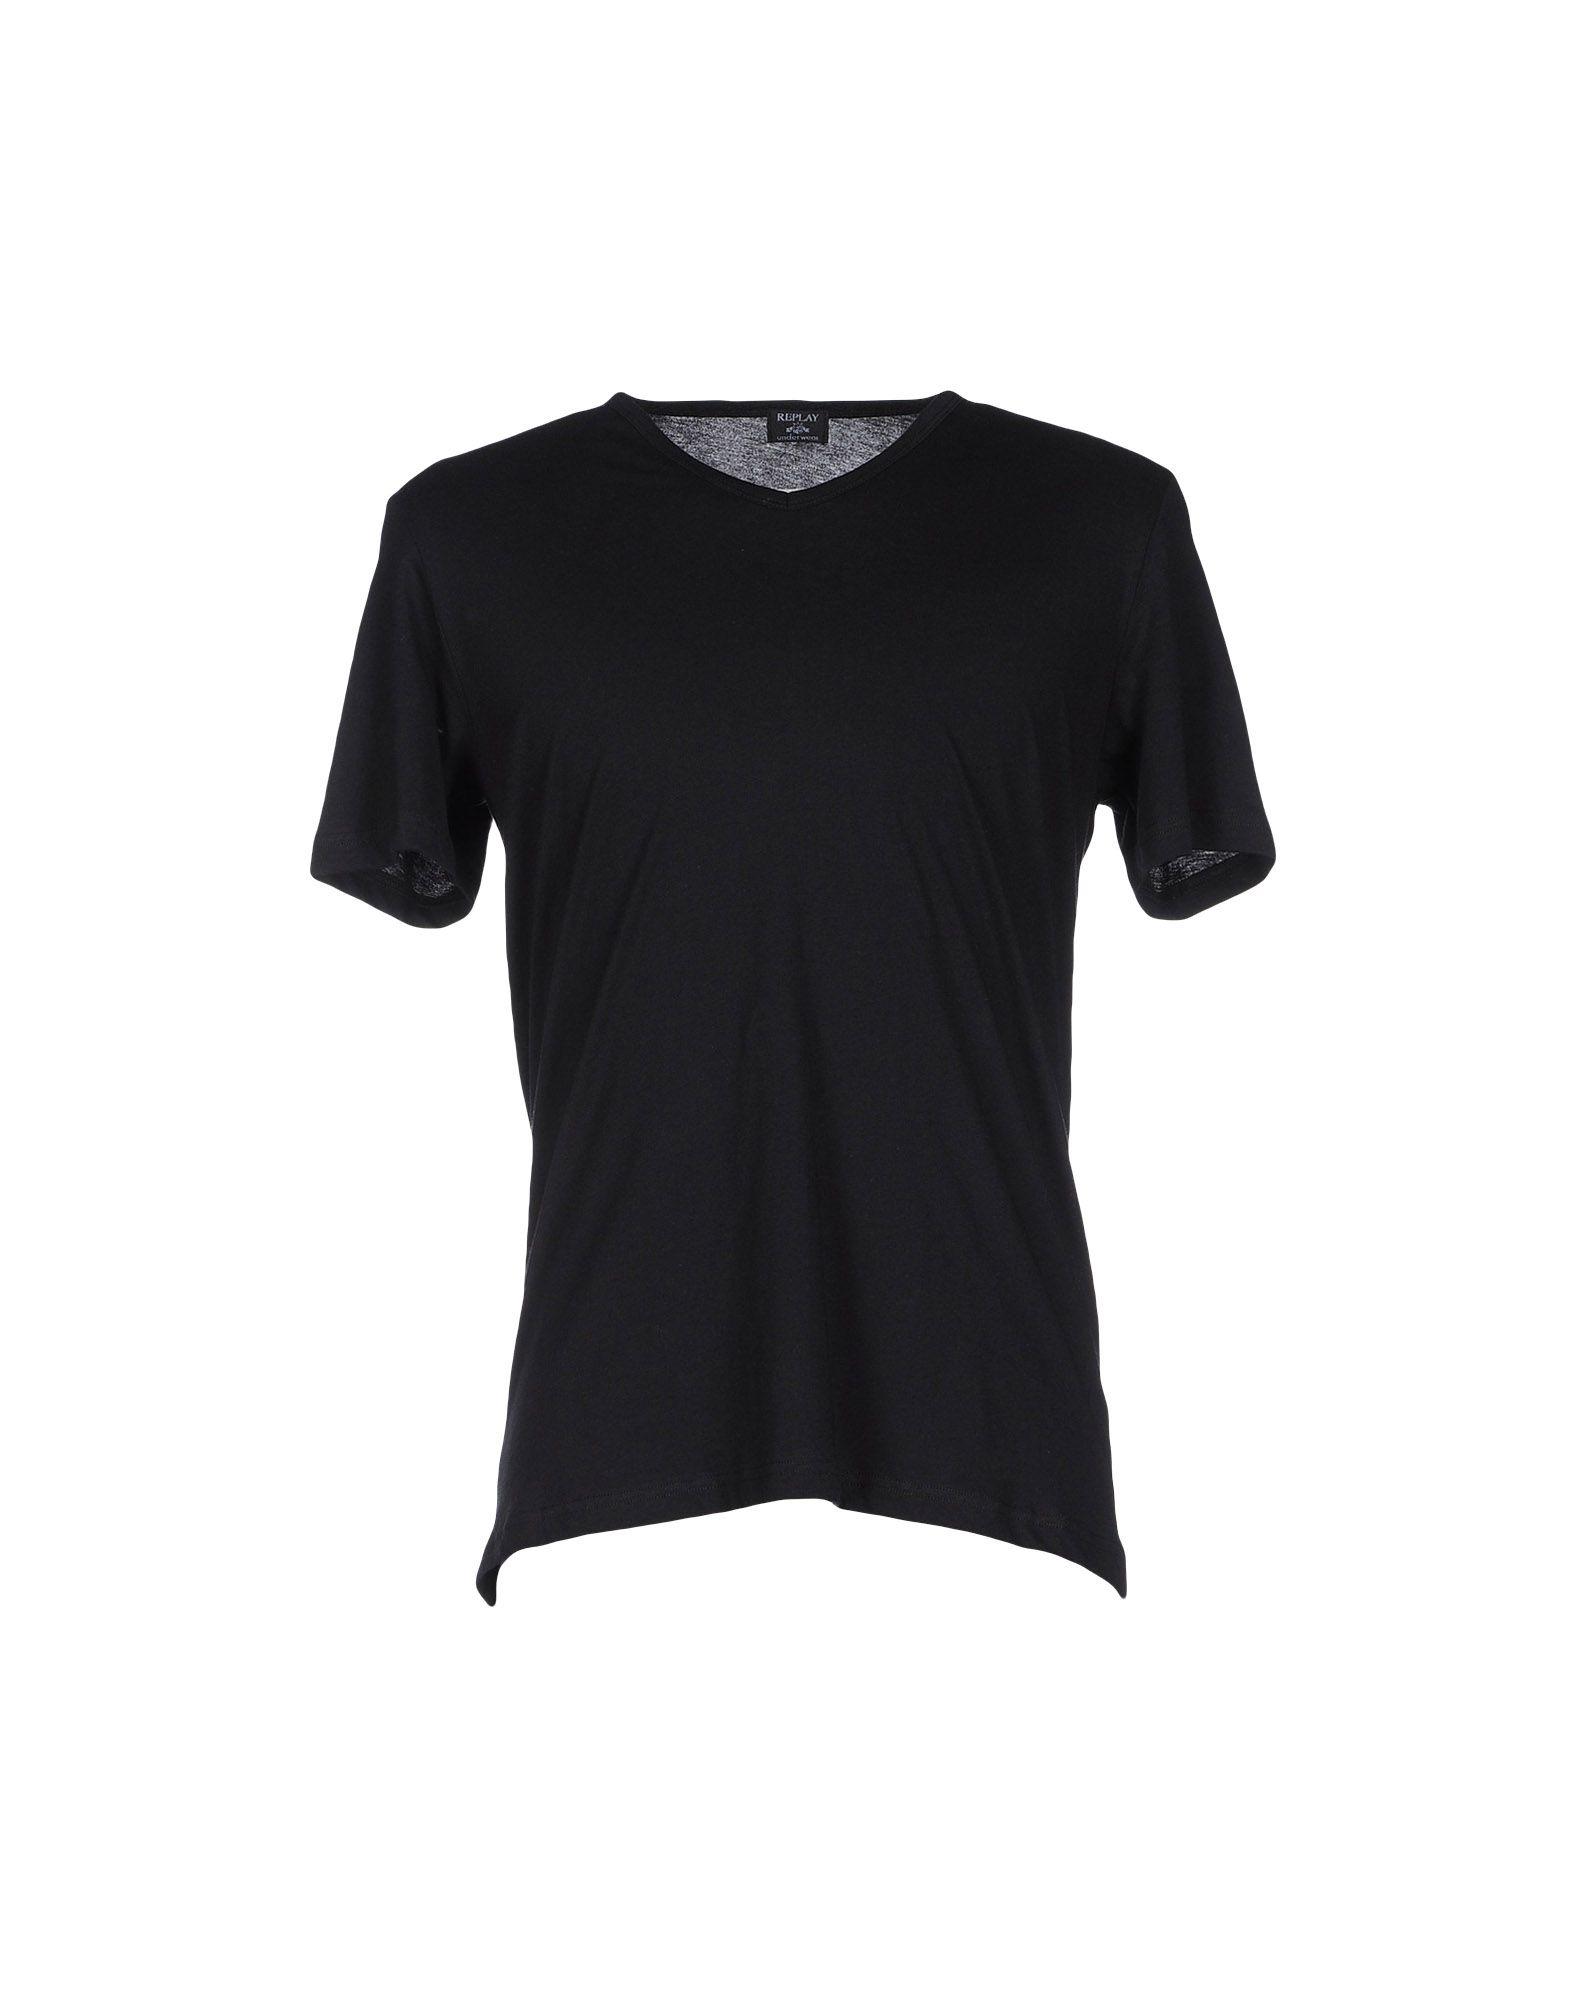 REPLAY UNDERWEAR Футболка футболка replay 121xw3291 xw3291